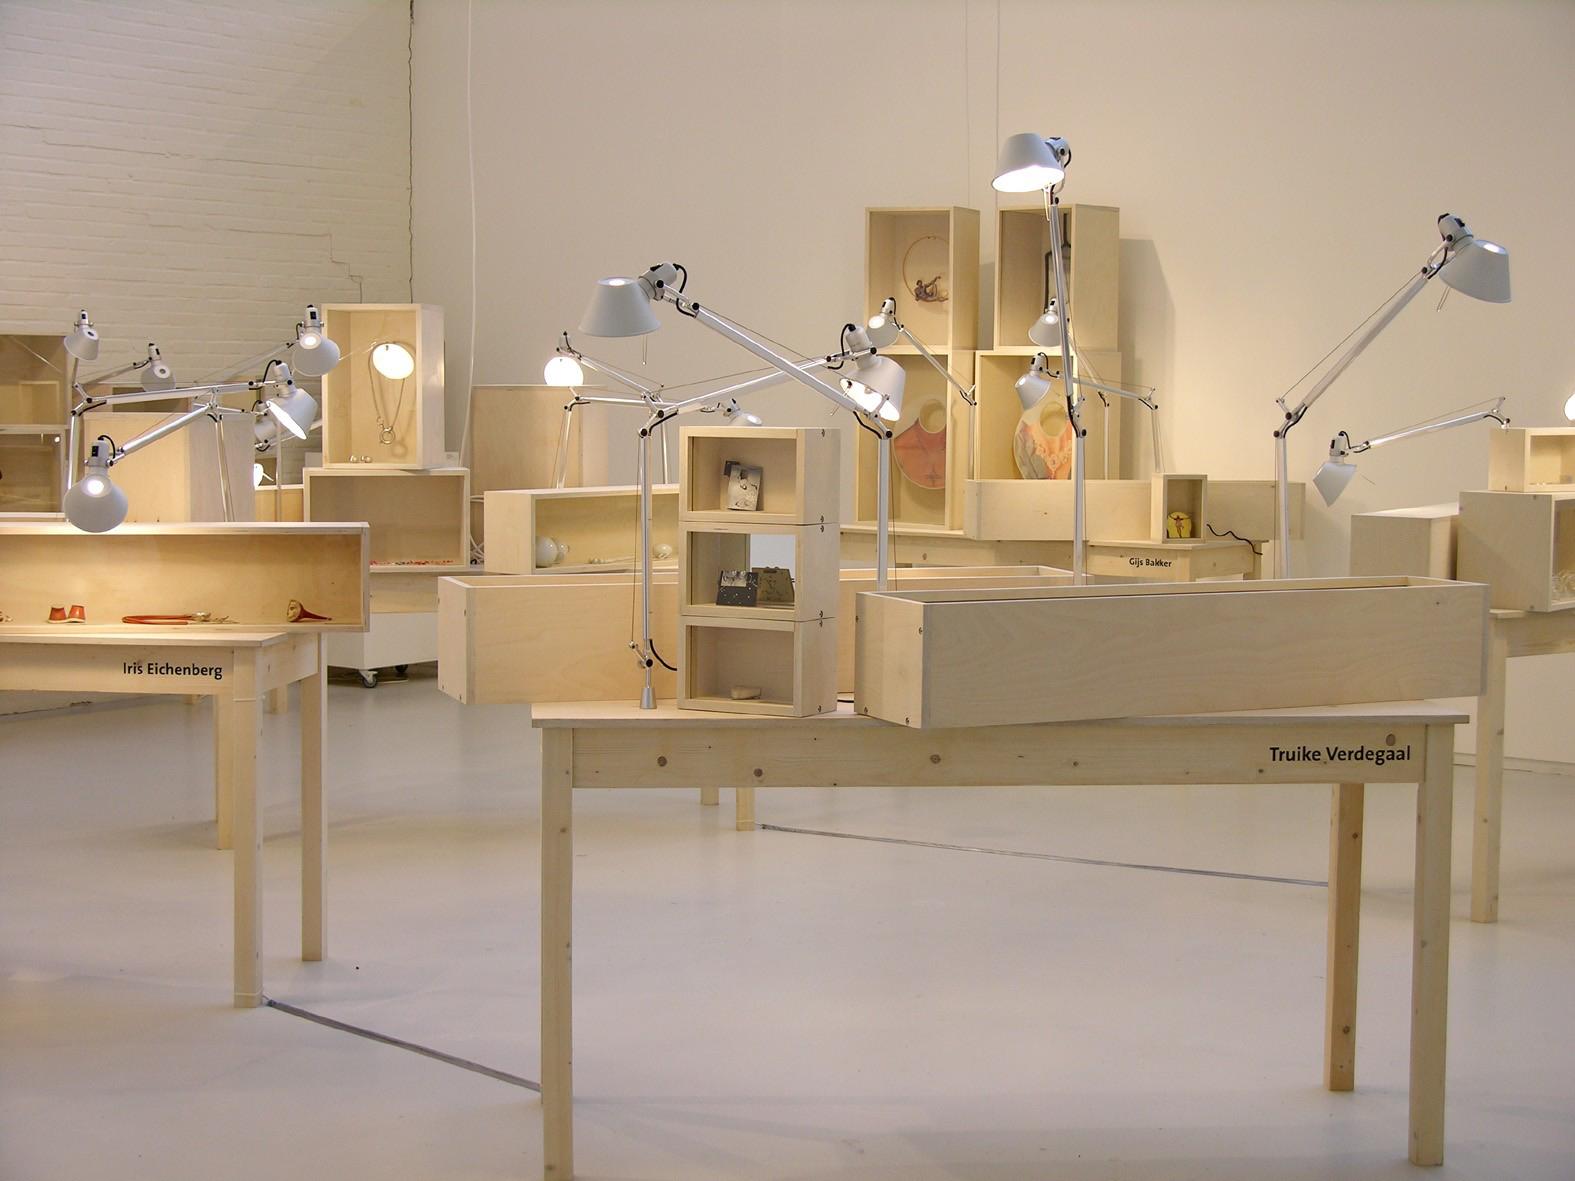 Sterke Verhalen, hedendaagse verhalende sieraden uit Nederland, SMS, 2006, tentoonstelling